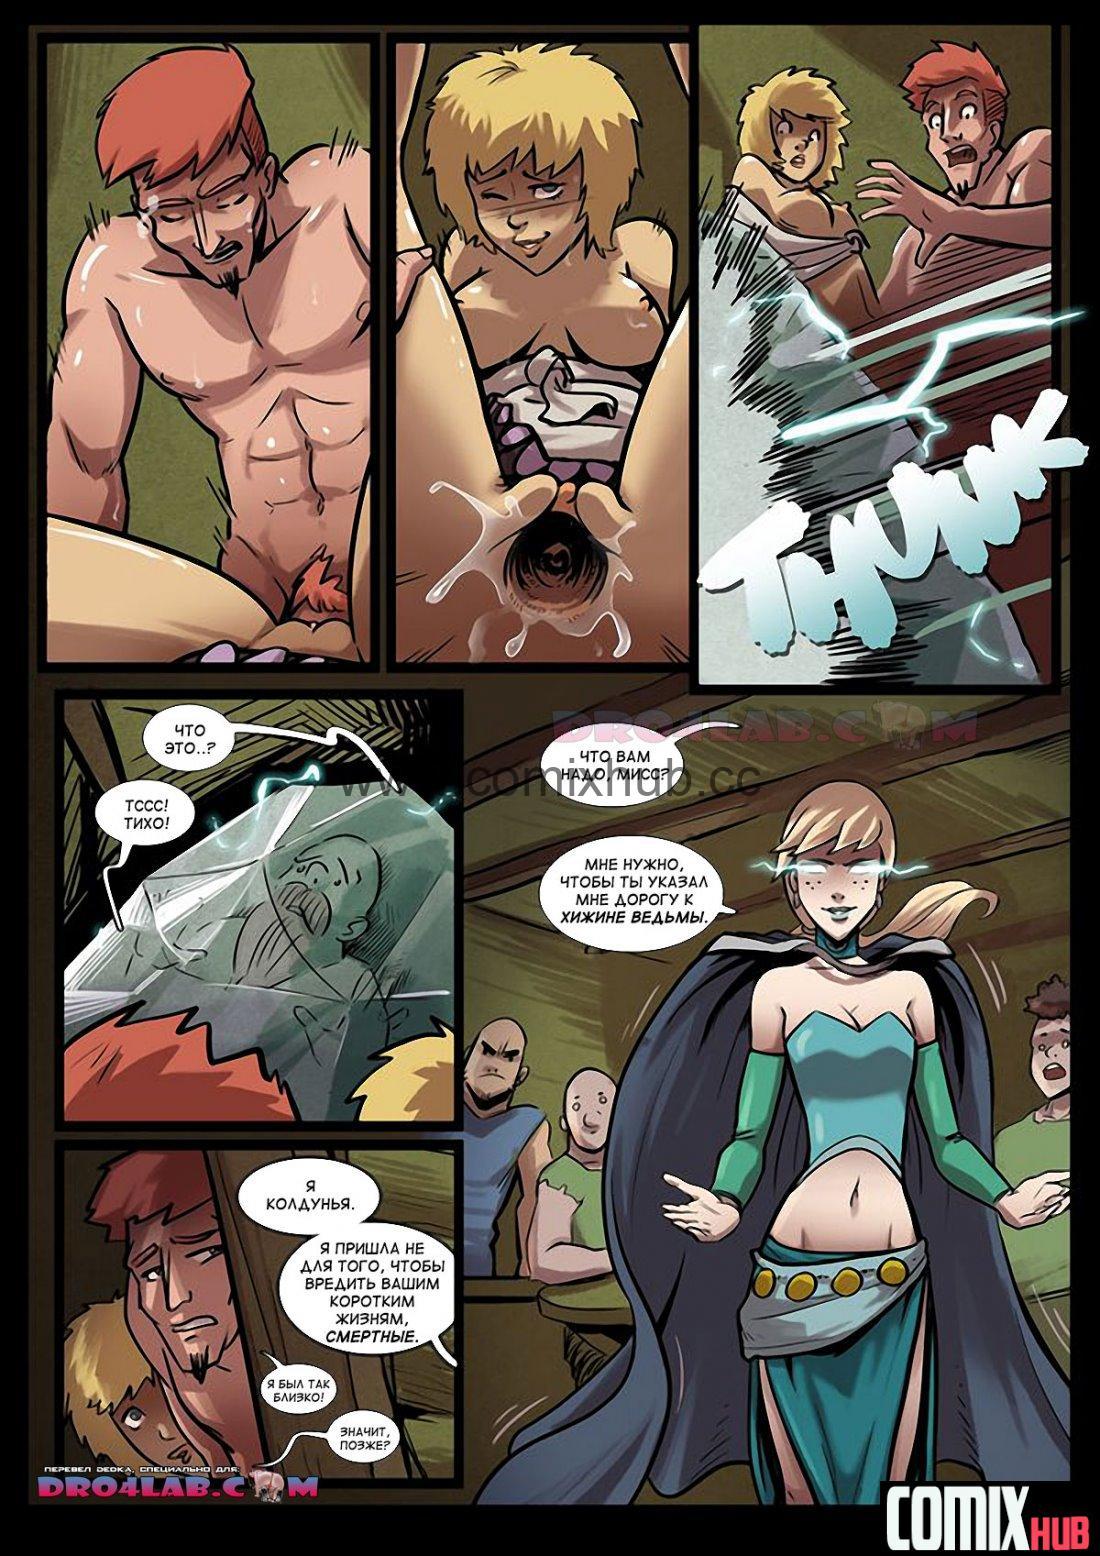 Порно комикс, Волшебница, часть 16 Порно комиксы, Анал, Групповой секс, Двойное проникновение